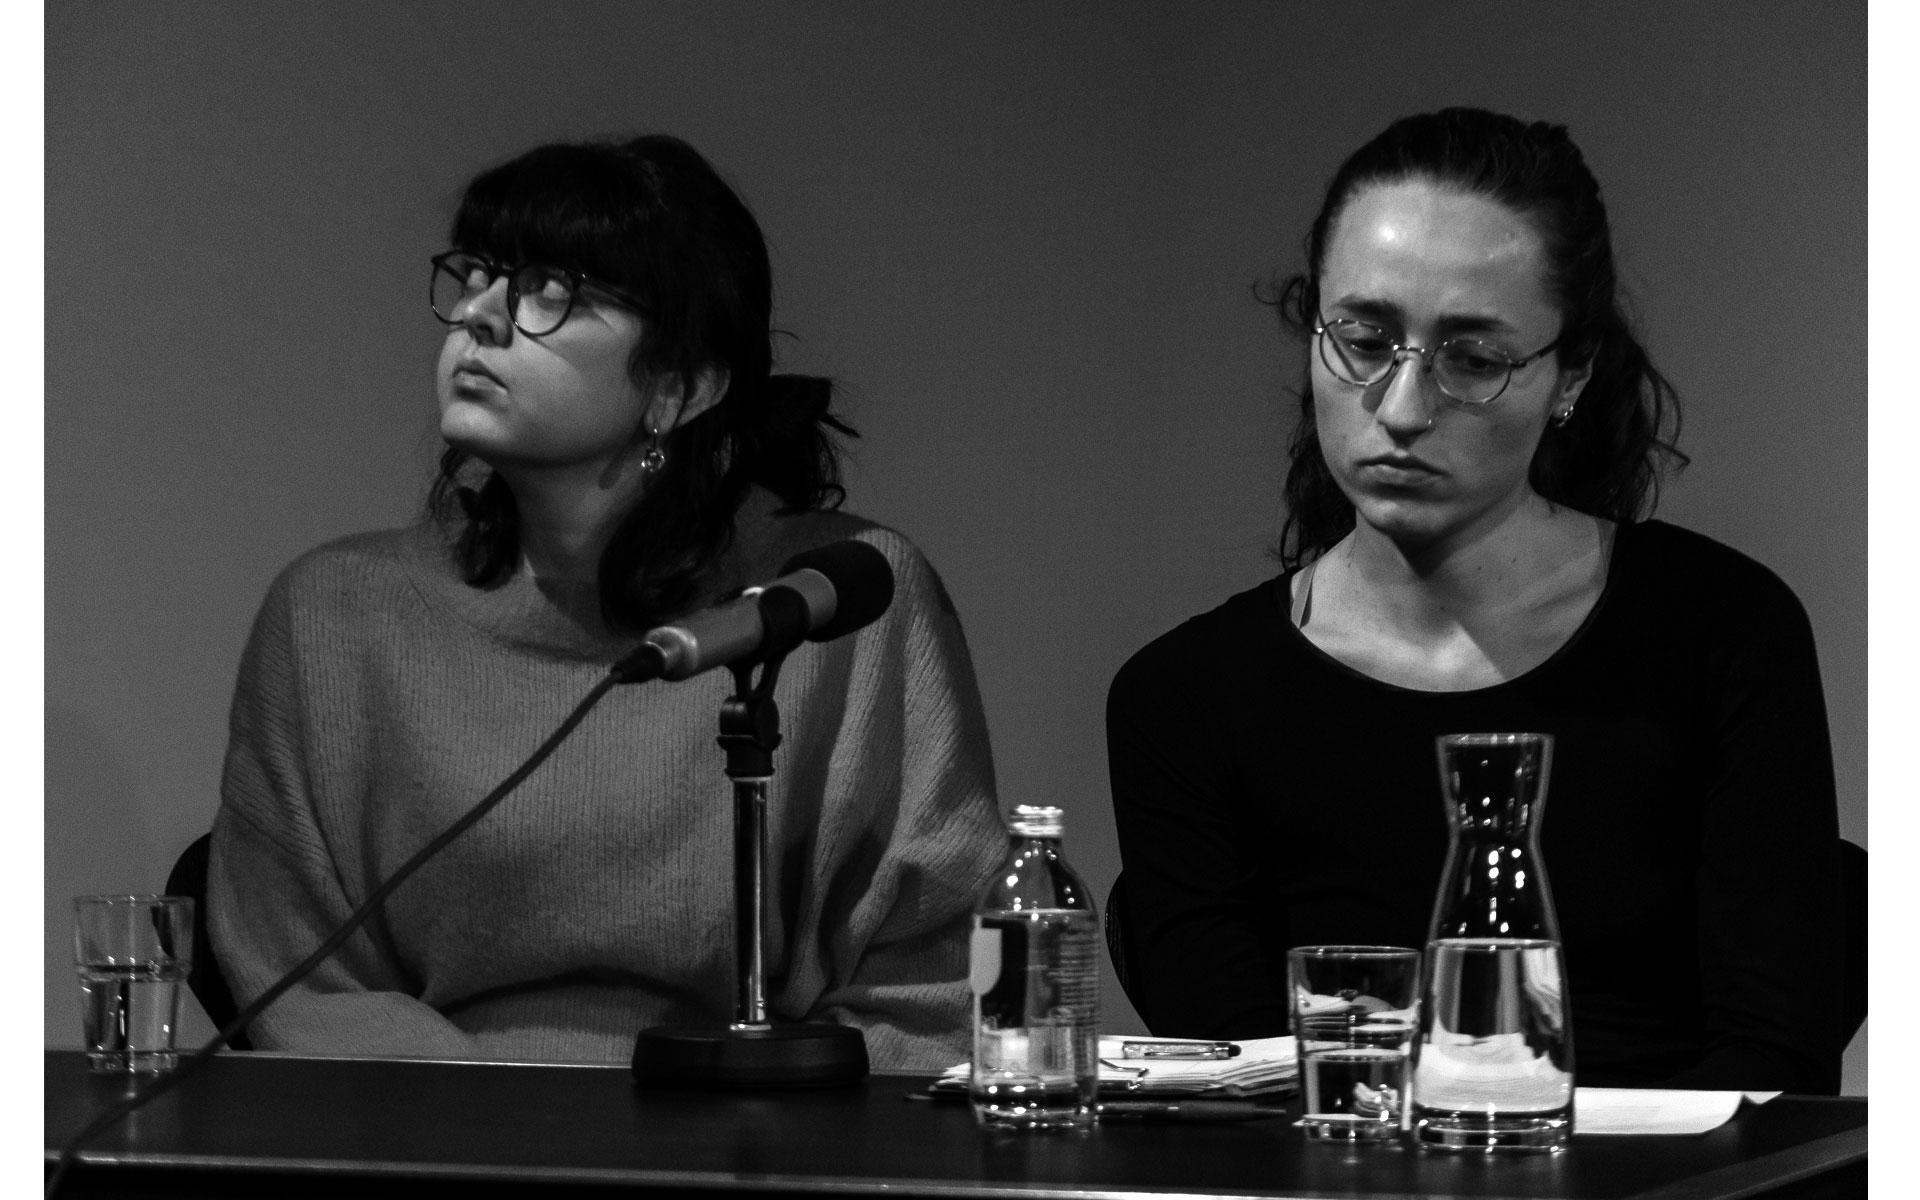 Nather Henafe Alali, Rasha Abbas, Ilija Trojanow: Raum ohne Fenster - Literatur und Flucht, Montag, 18.02.19               /                   19.30              Uhr <br/>(c) Simon Adolphi